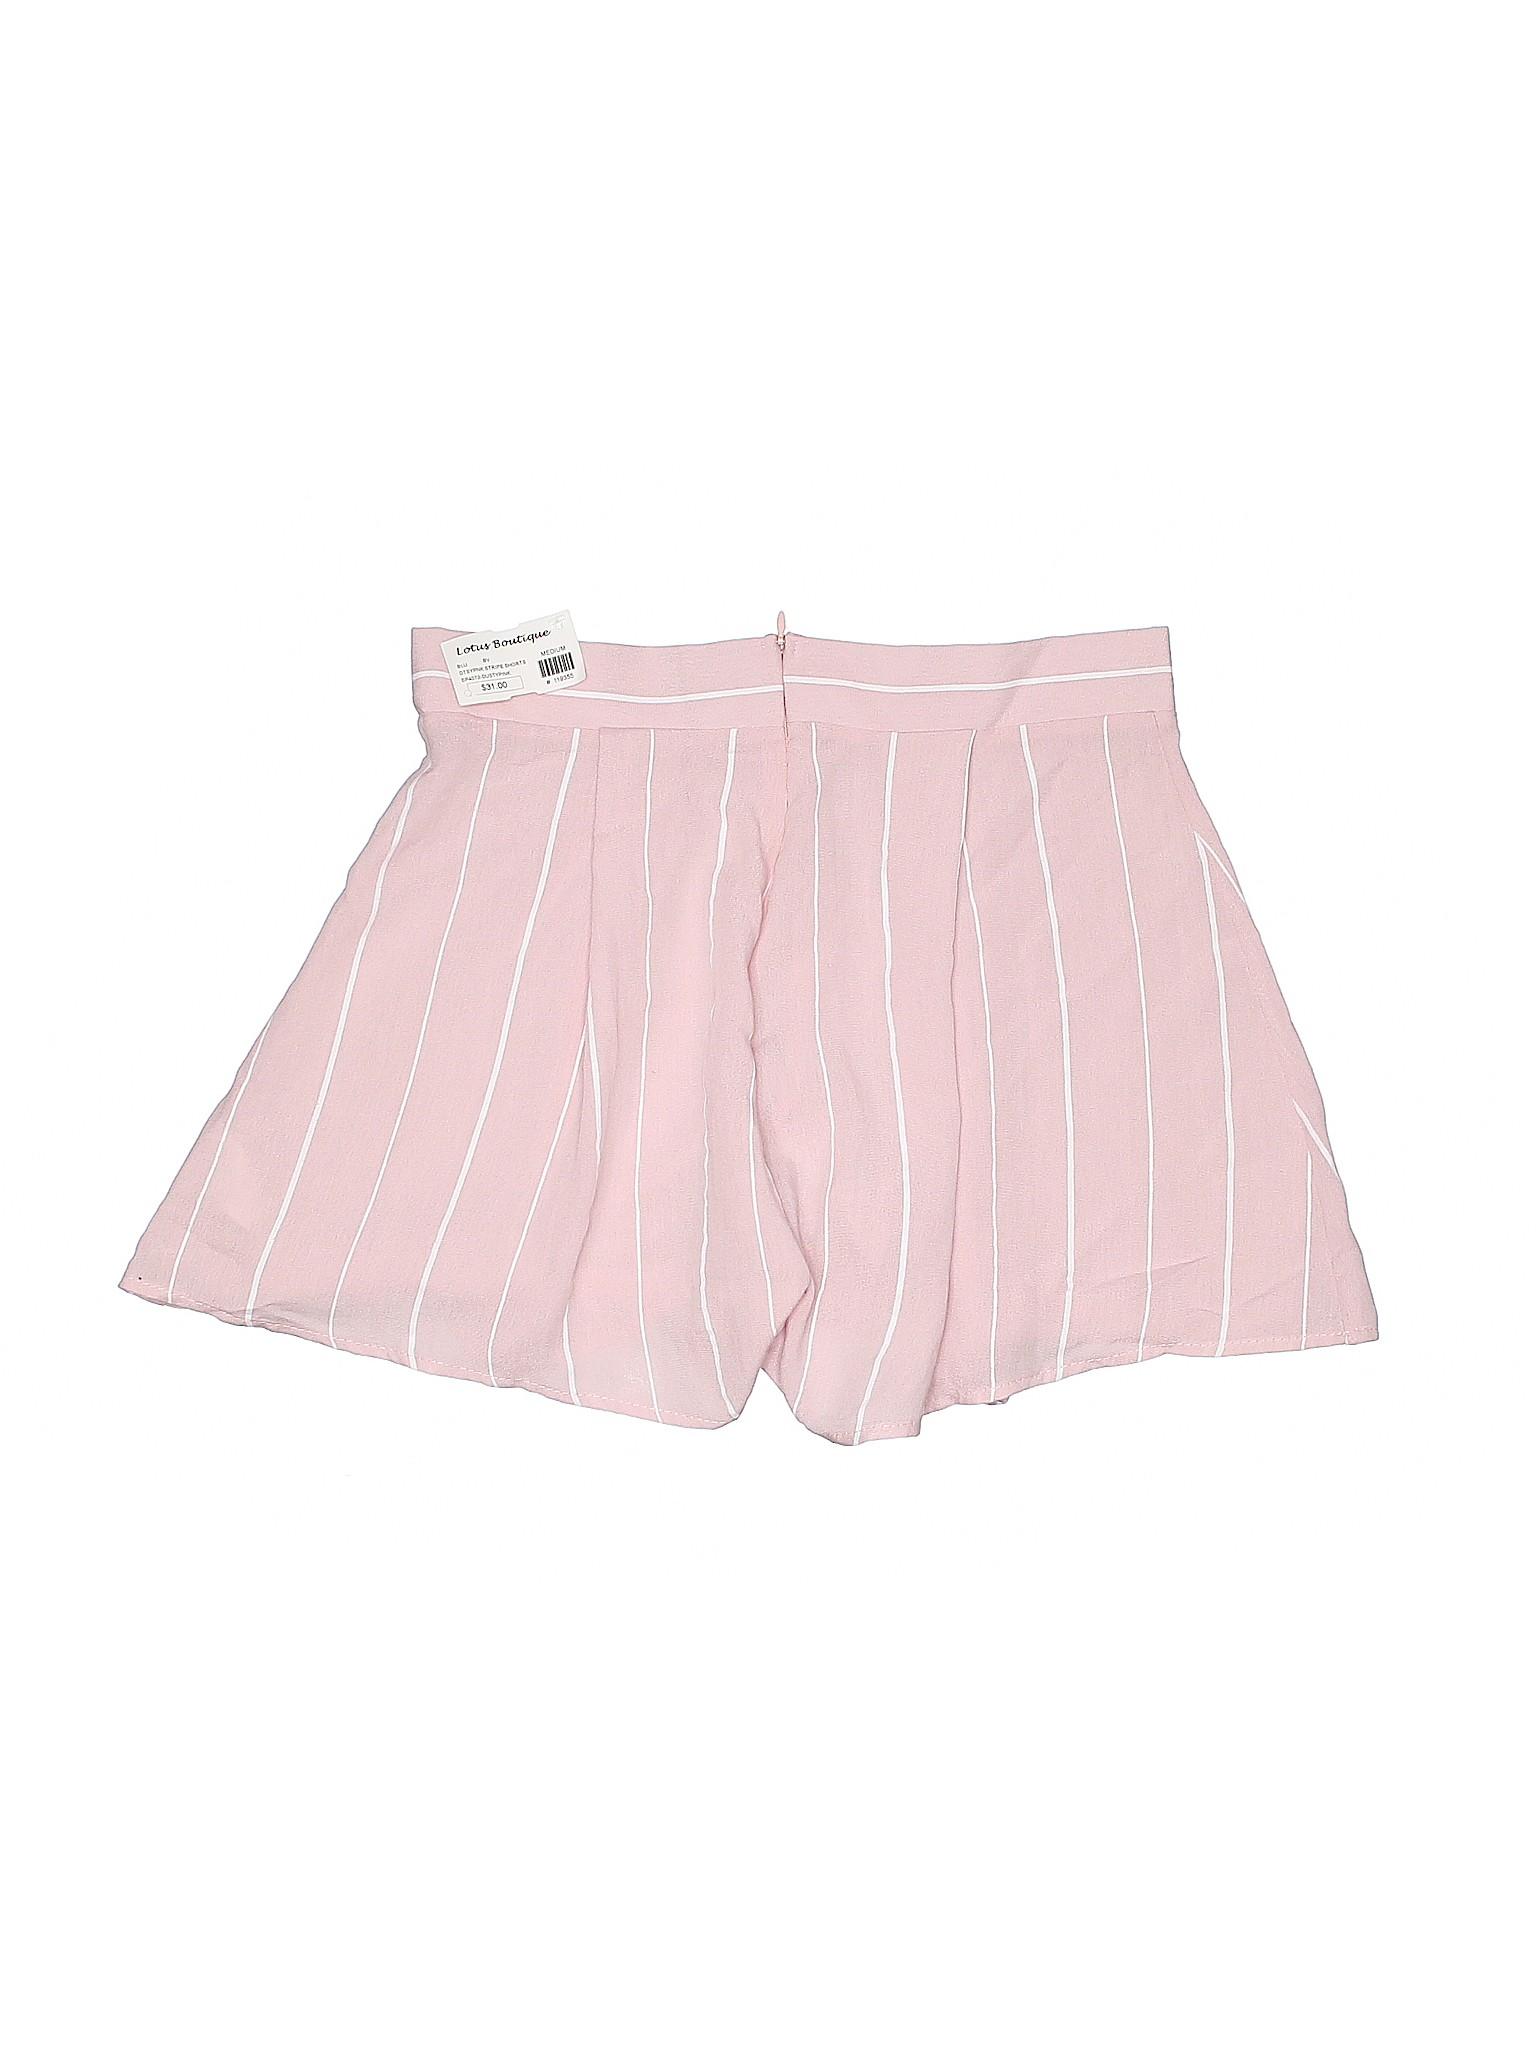 Boutique Winter Blush Shorts Dressy Blue qnB0pqO